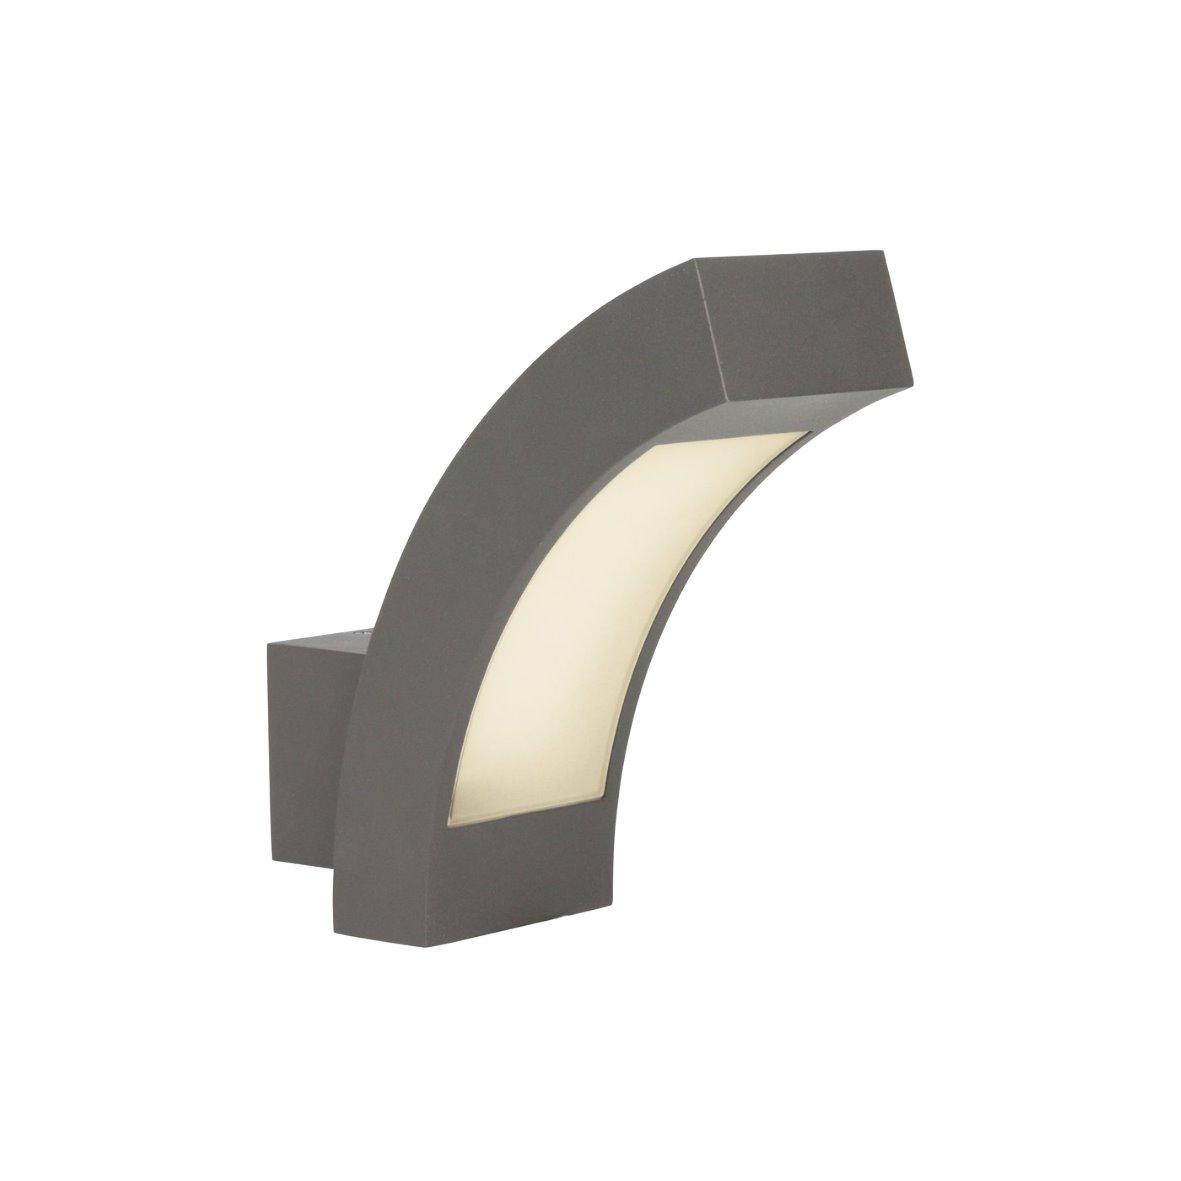 heitronic slv led gartenleuchte 230v aussenleuchte garten leuchte spot strahler ebay. Black Bedroom Furniture Sets. Home Design Ideas